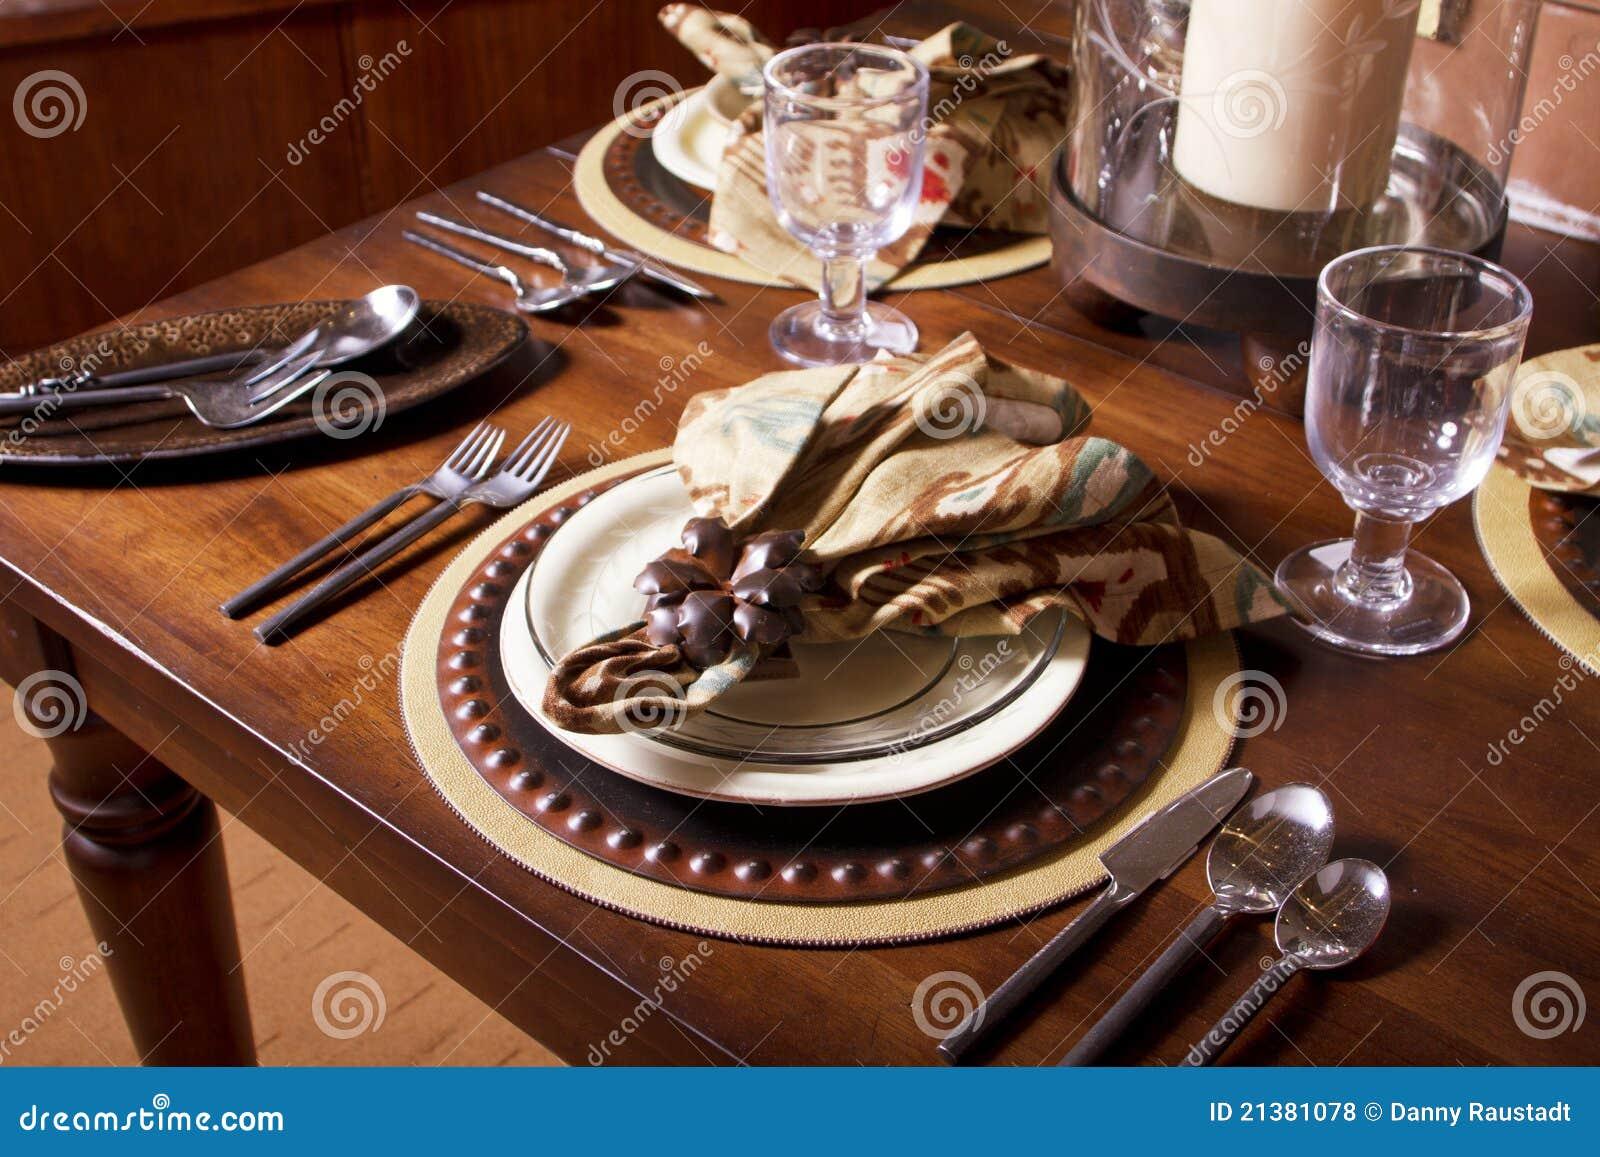 Elegant Table Place Setting Royalty Free Stock Photos